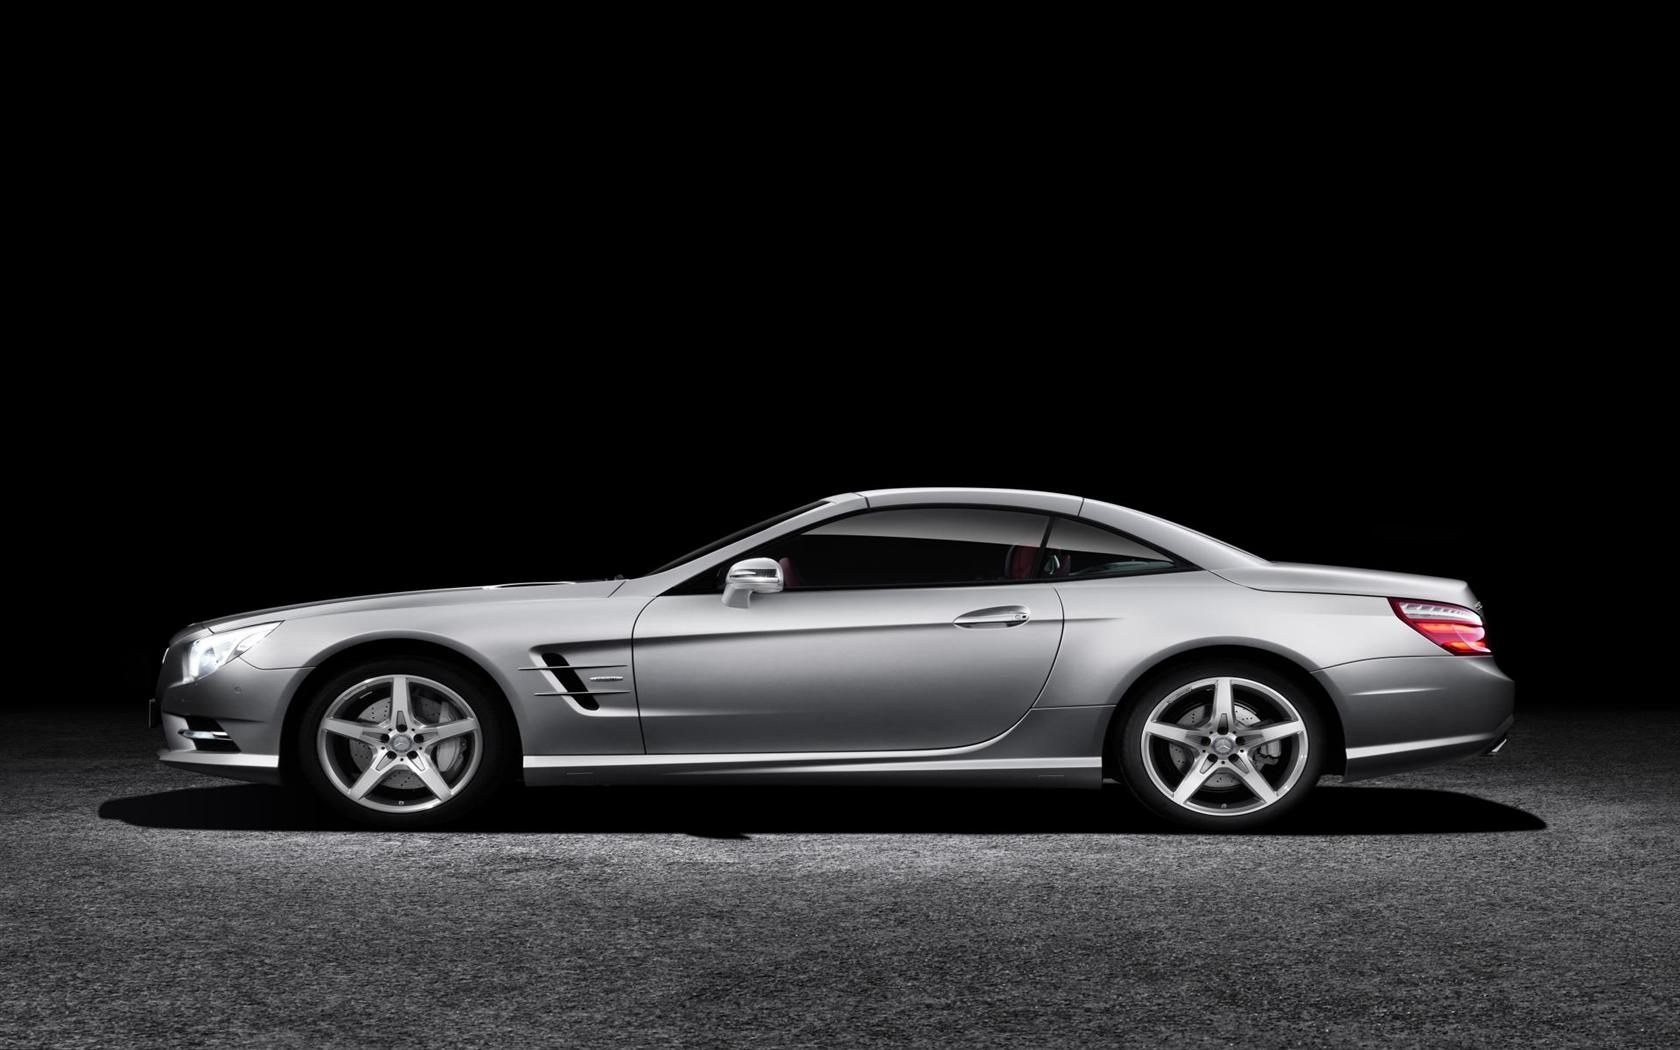 2013 Mercedes-Benz SL-Class Image